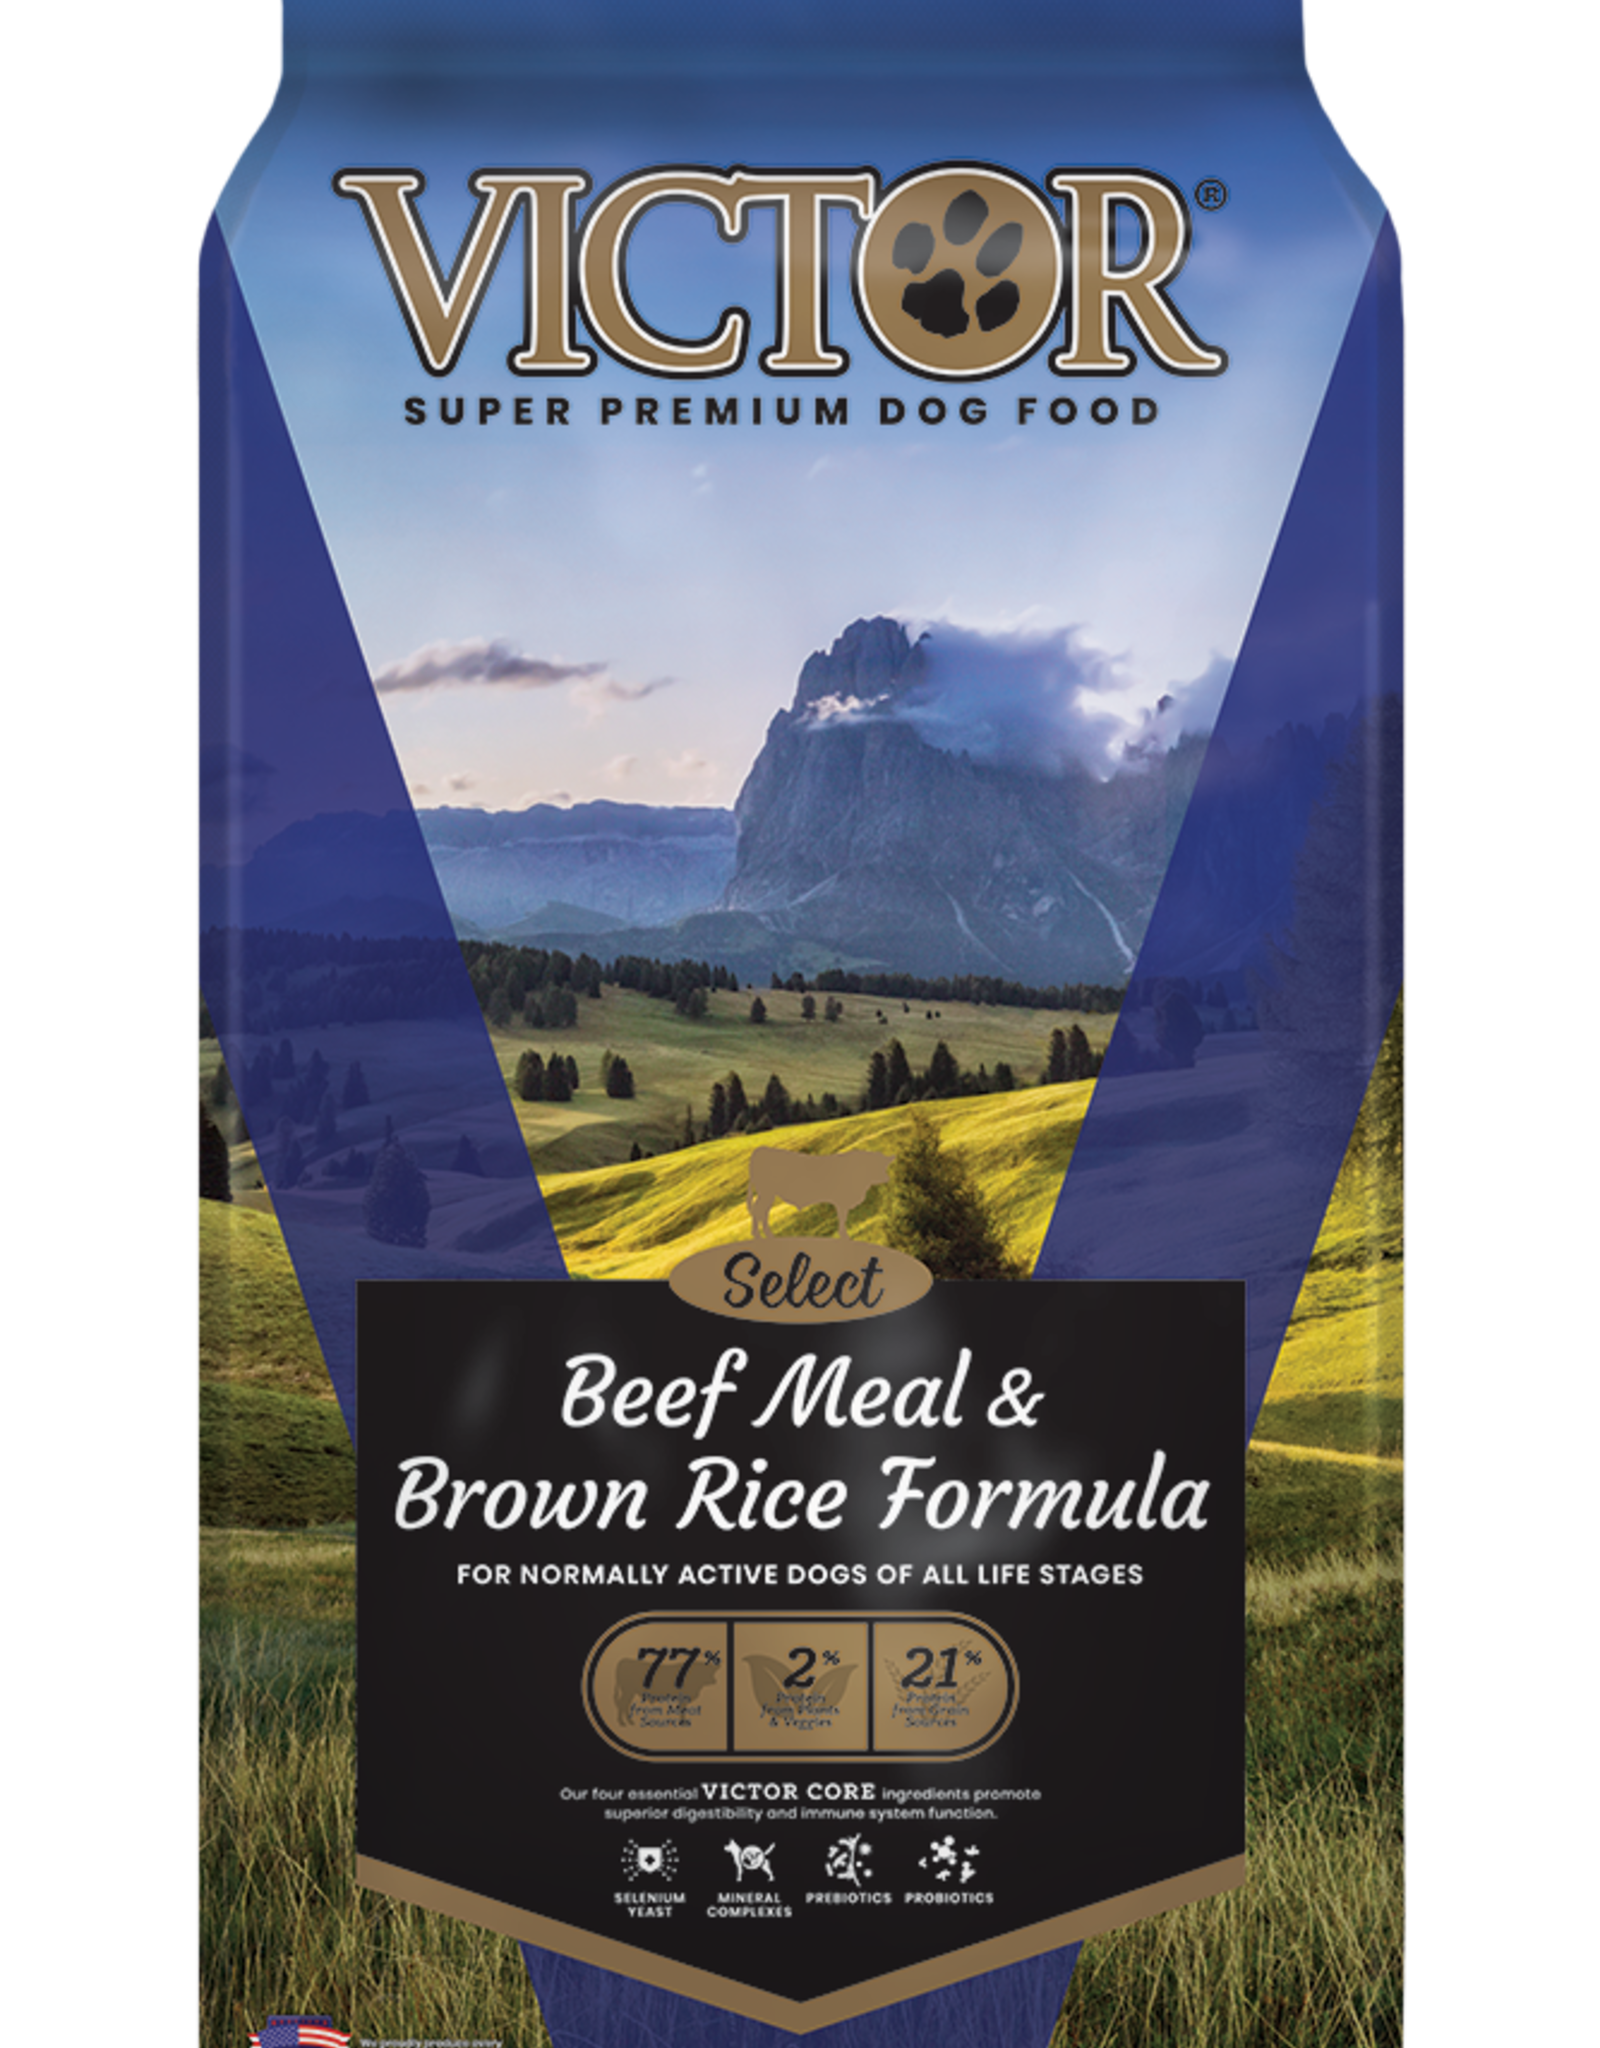 Victor Victor Dog Food Beef Meal & Brown Rice